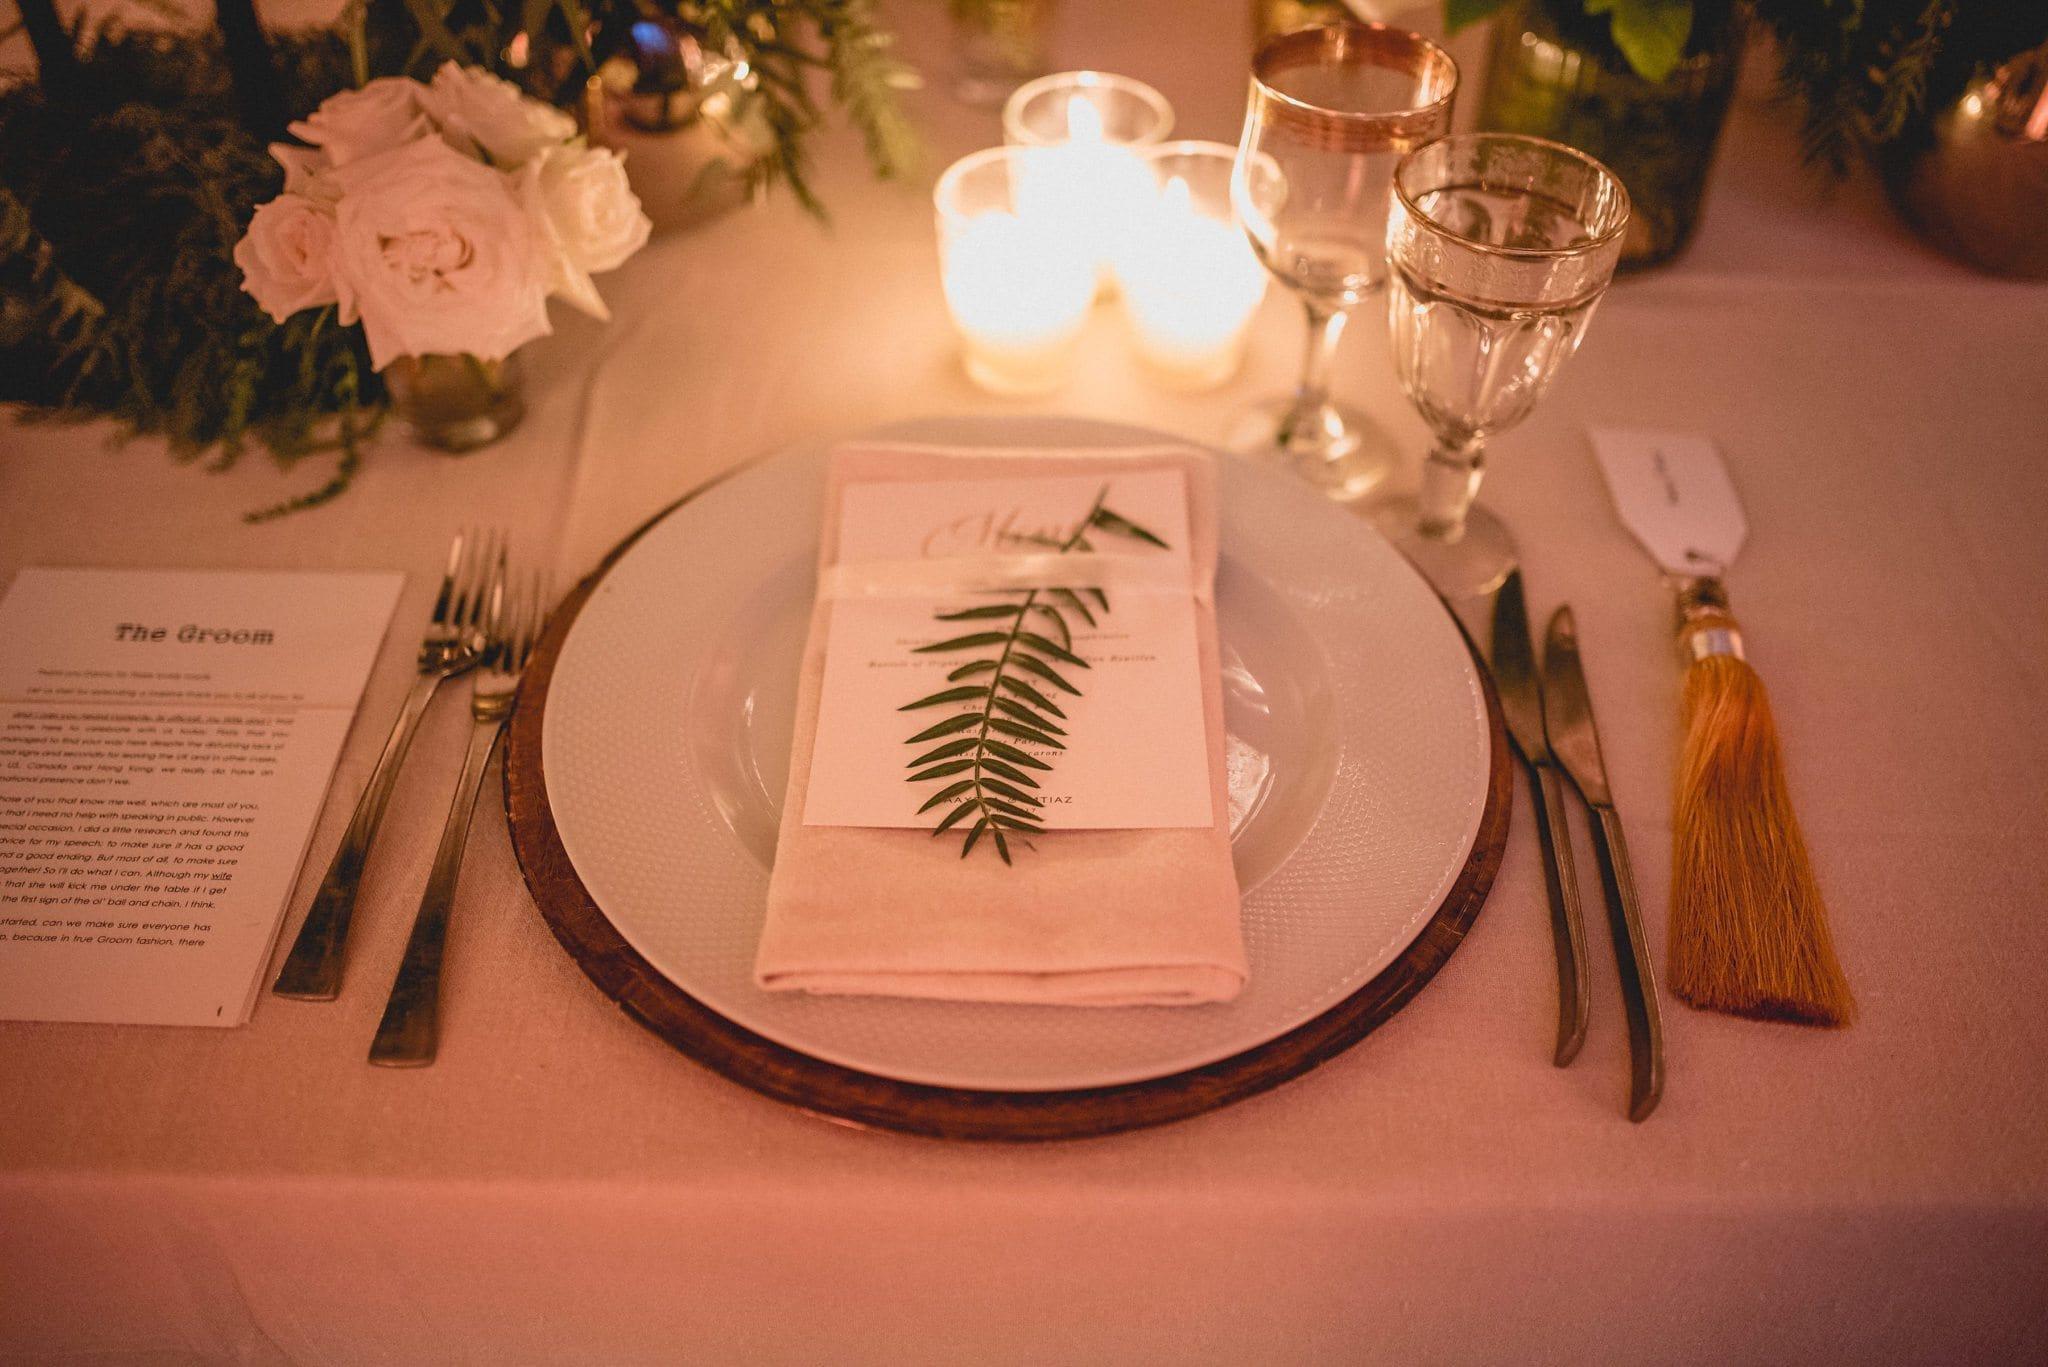 Gorgeous luxurious table setting at Ksar Char bagh Marrakech destination Wedding